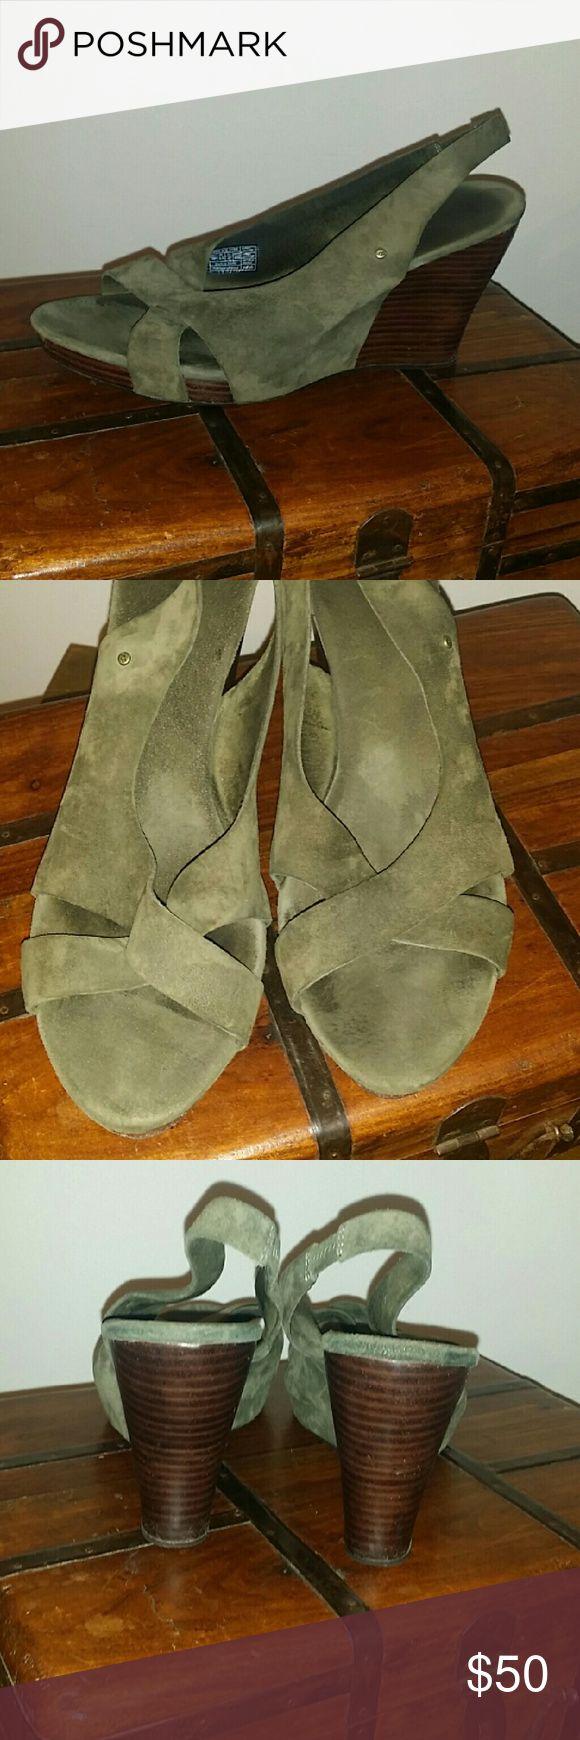 Suede UGG Sandal Comfortable wedge in a olive green. Nice wooden heel. Brass Ugg detailing. EUC . UGG Shoes Wedges